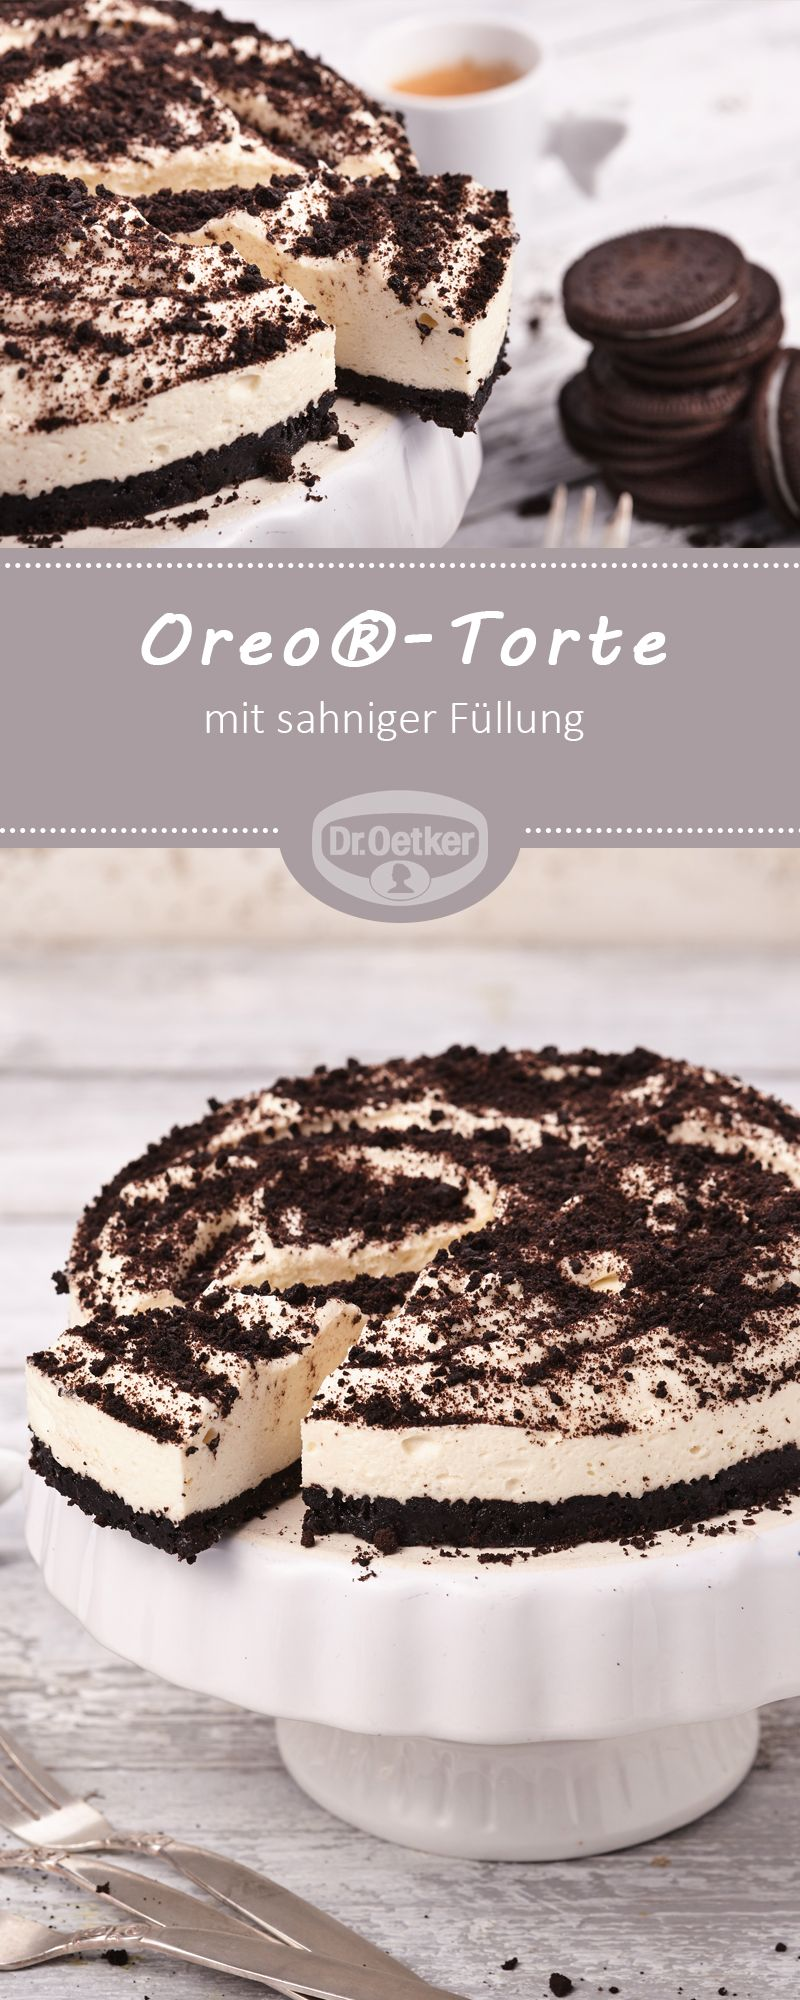 Oreo Torte Rezept Kuchen Oreo Torte Kuchen Und Backen